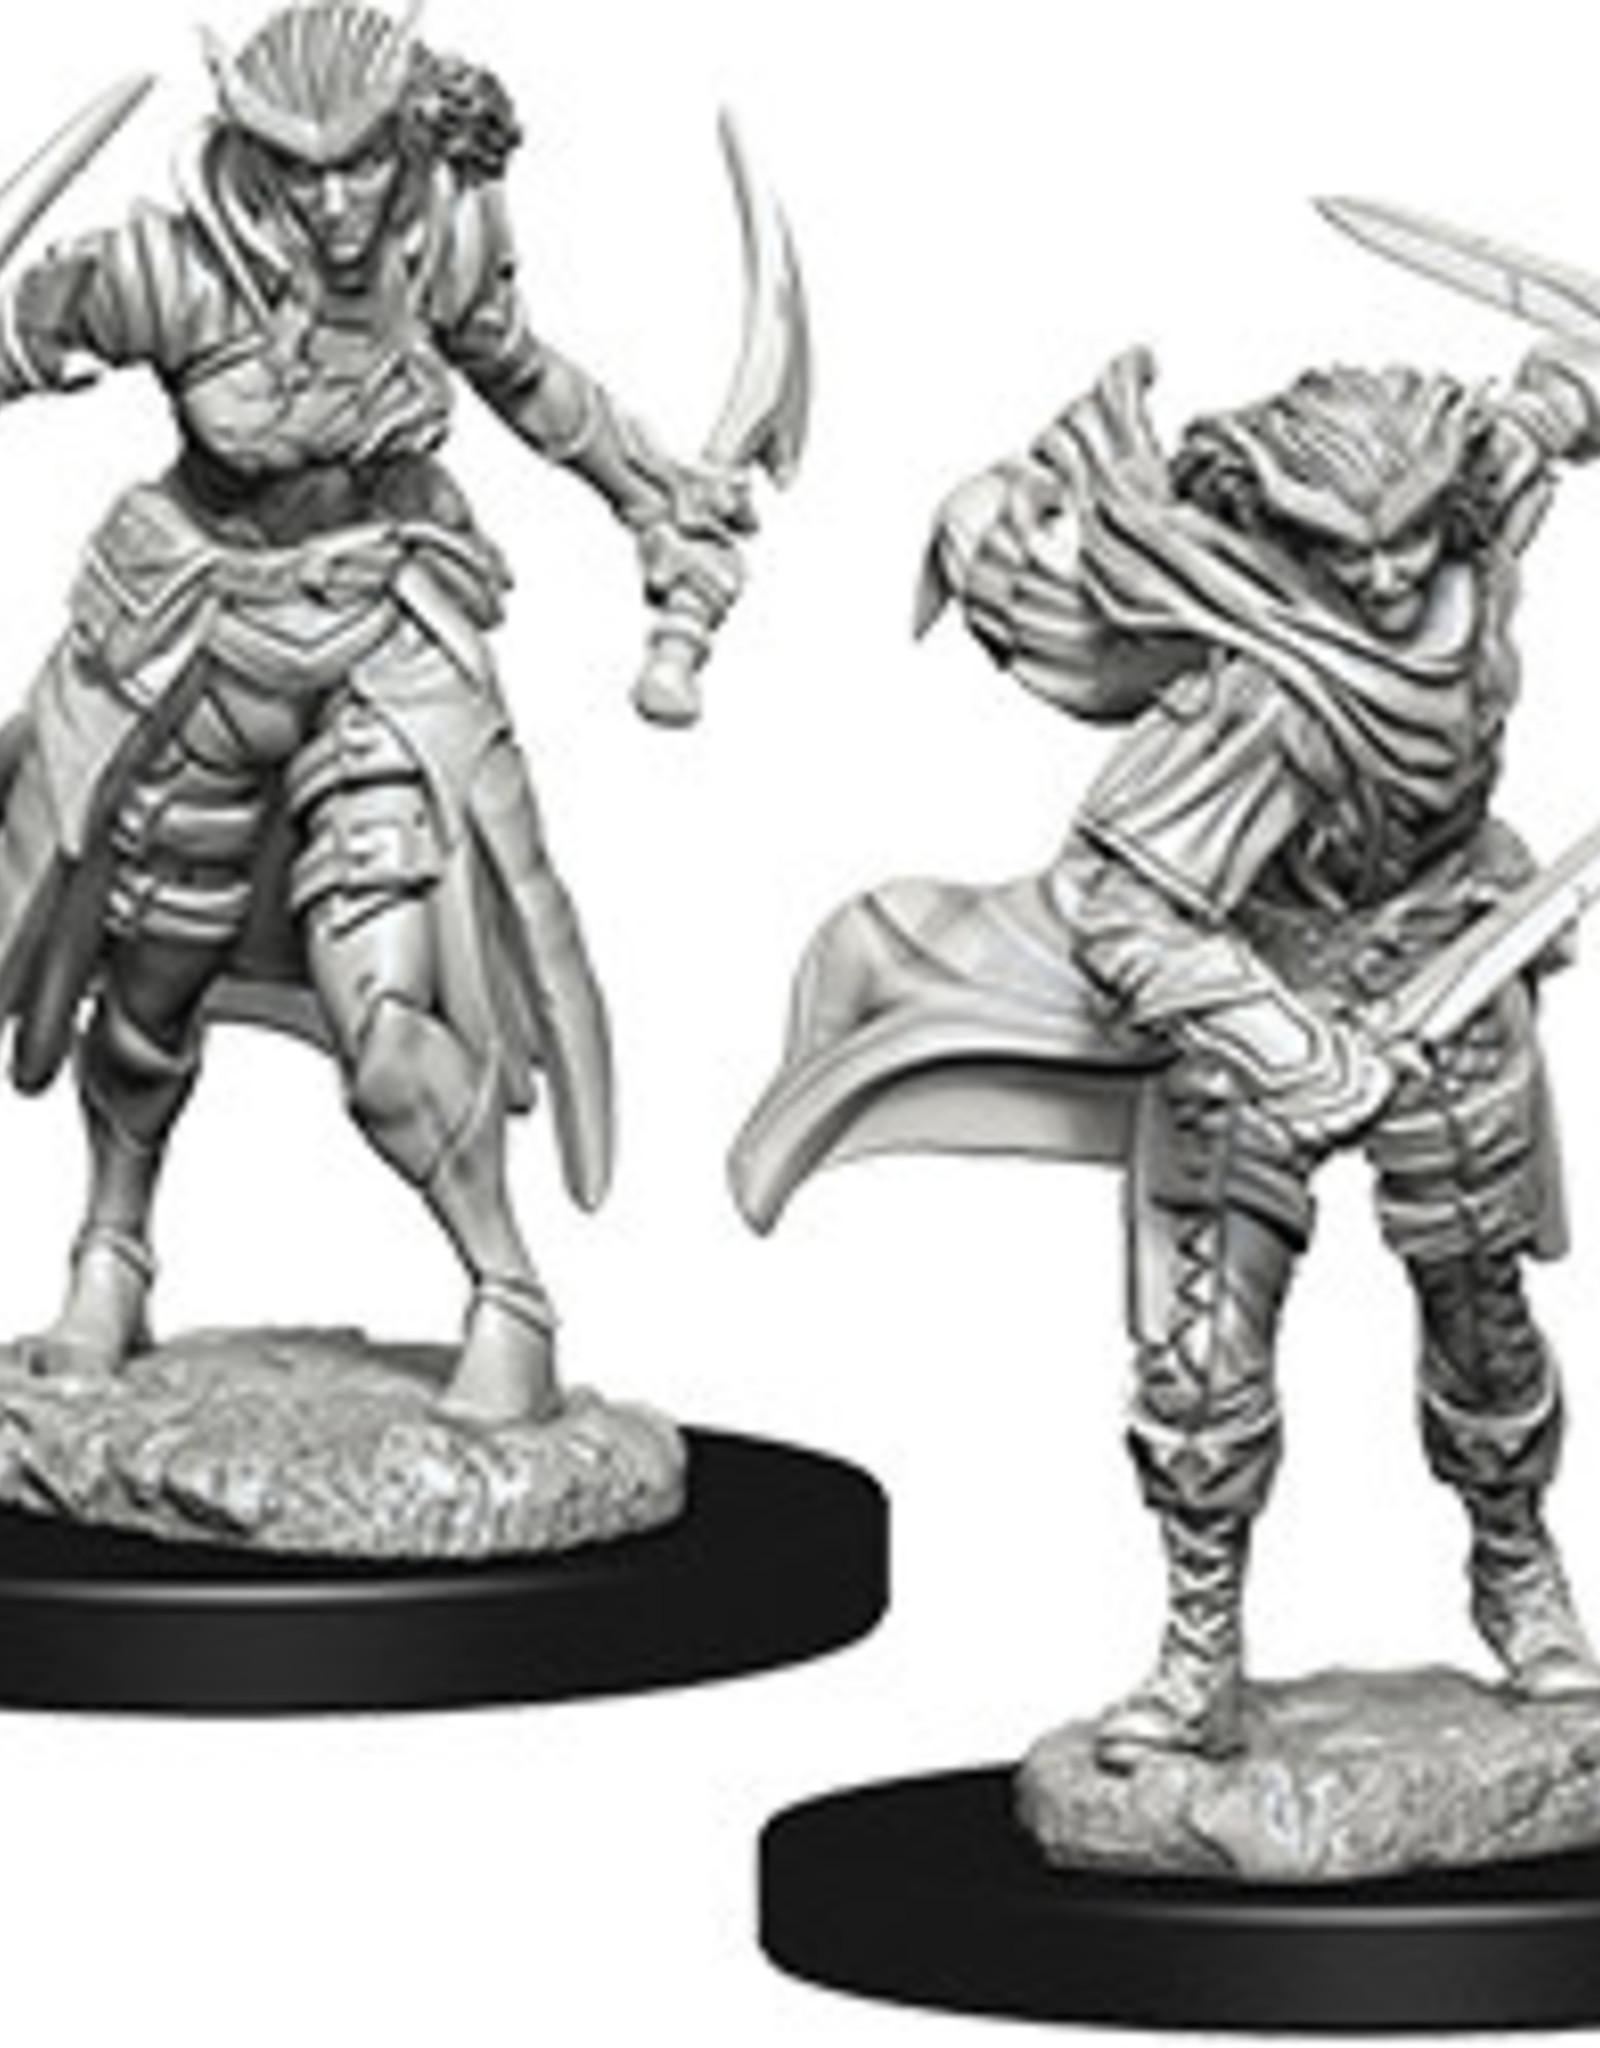 WizKids Dungeons & Dragons Nolzur's Marvelous Miniatures: Tiefling Female Rogue